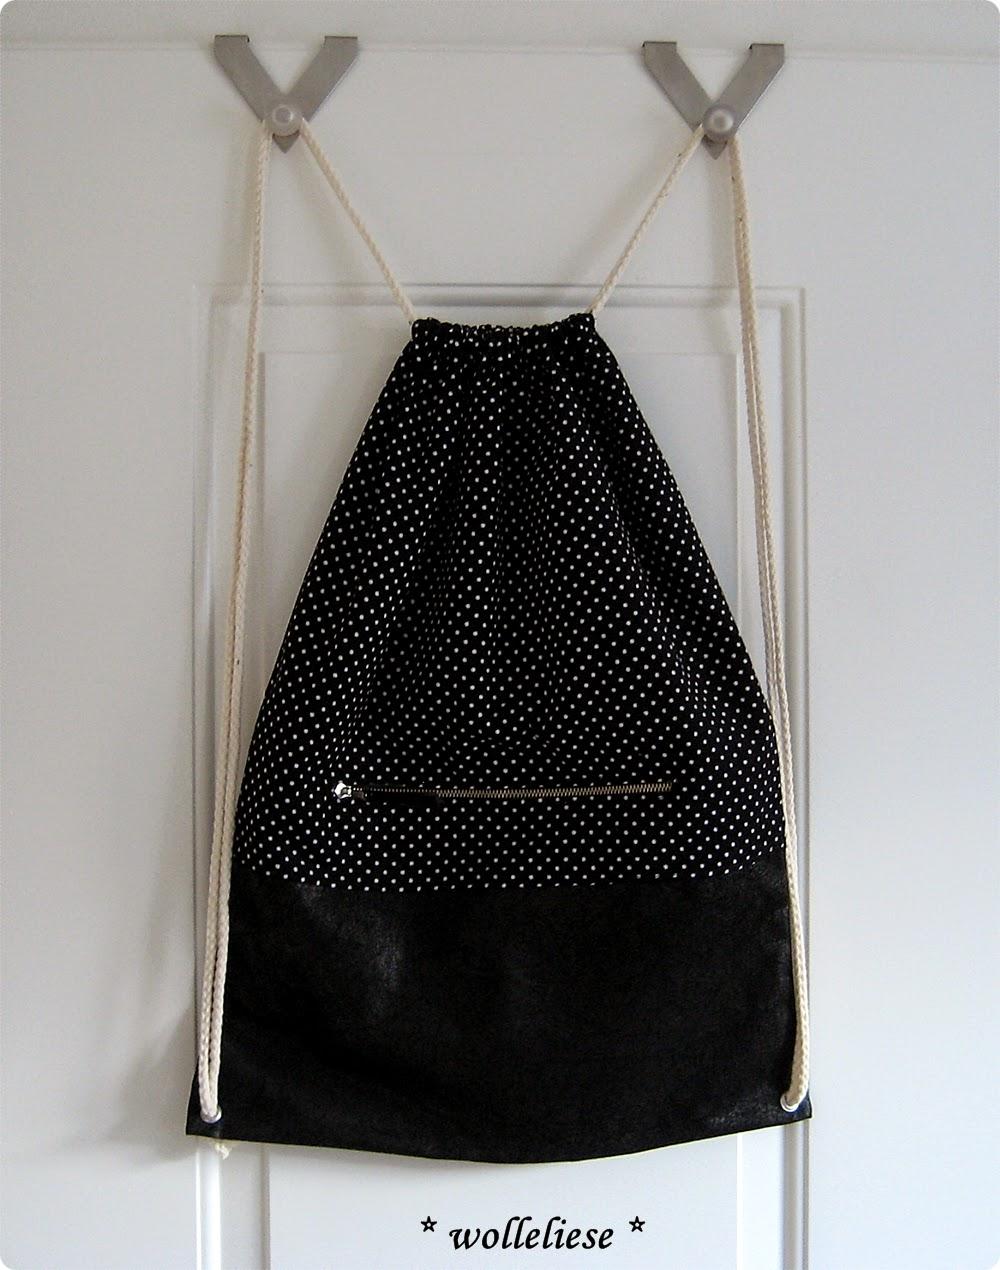 wolleliese beutel rucksack rucksack beutel. Black Bedroom Furniture Sets. Home Design Ideas